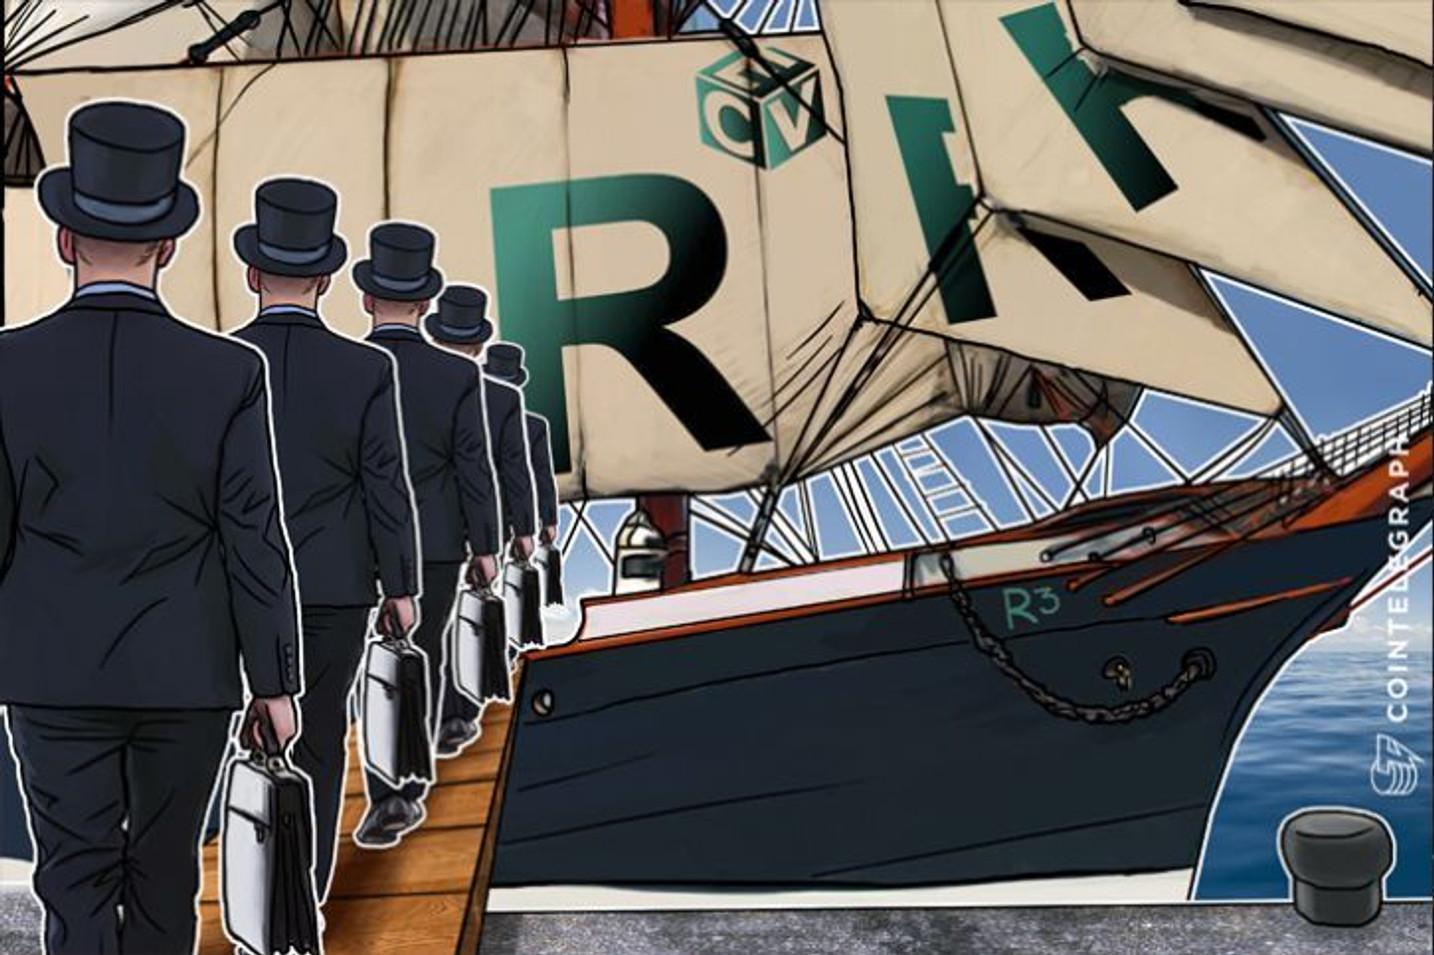 R3 Consortium Sues Blockchain Platform Ripple Over Cancelled Billion Dollar Contract